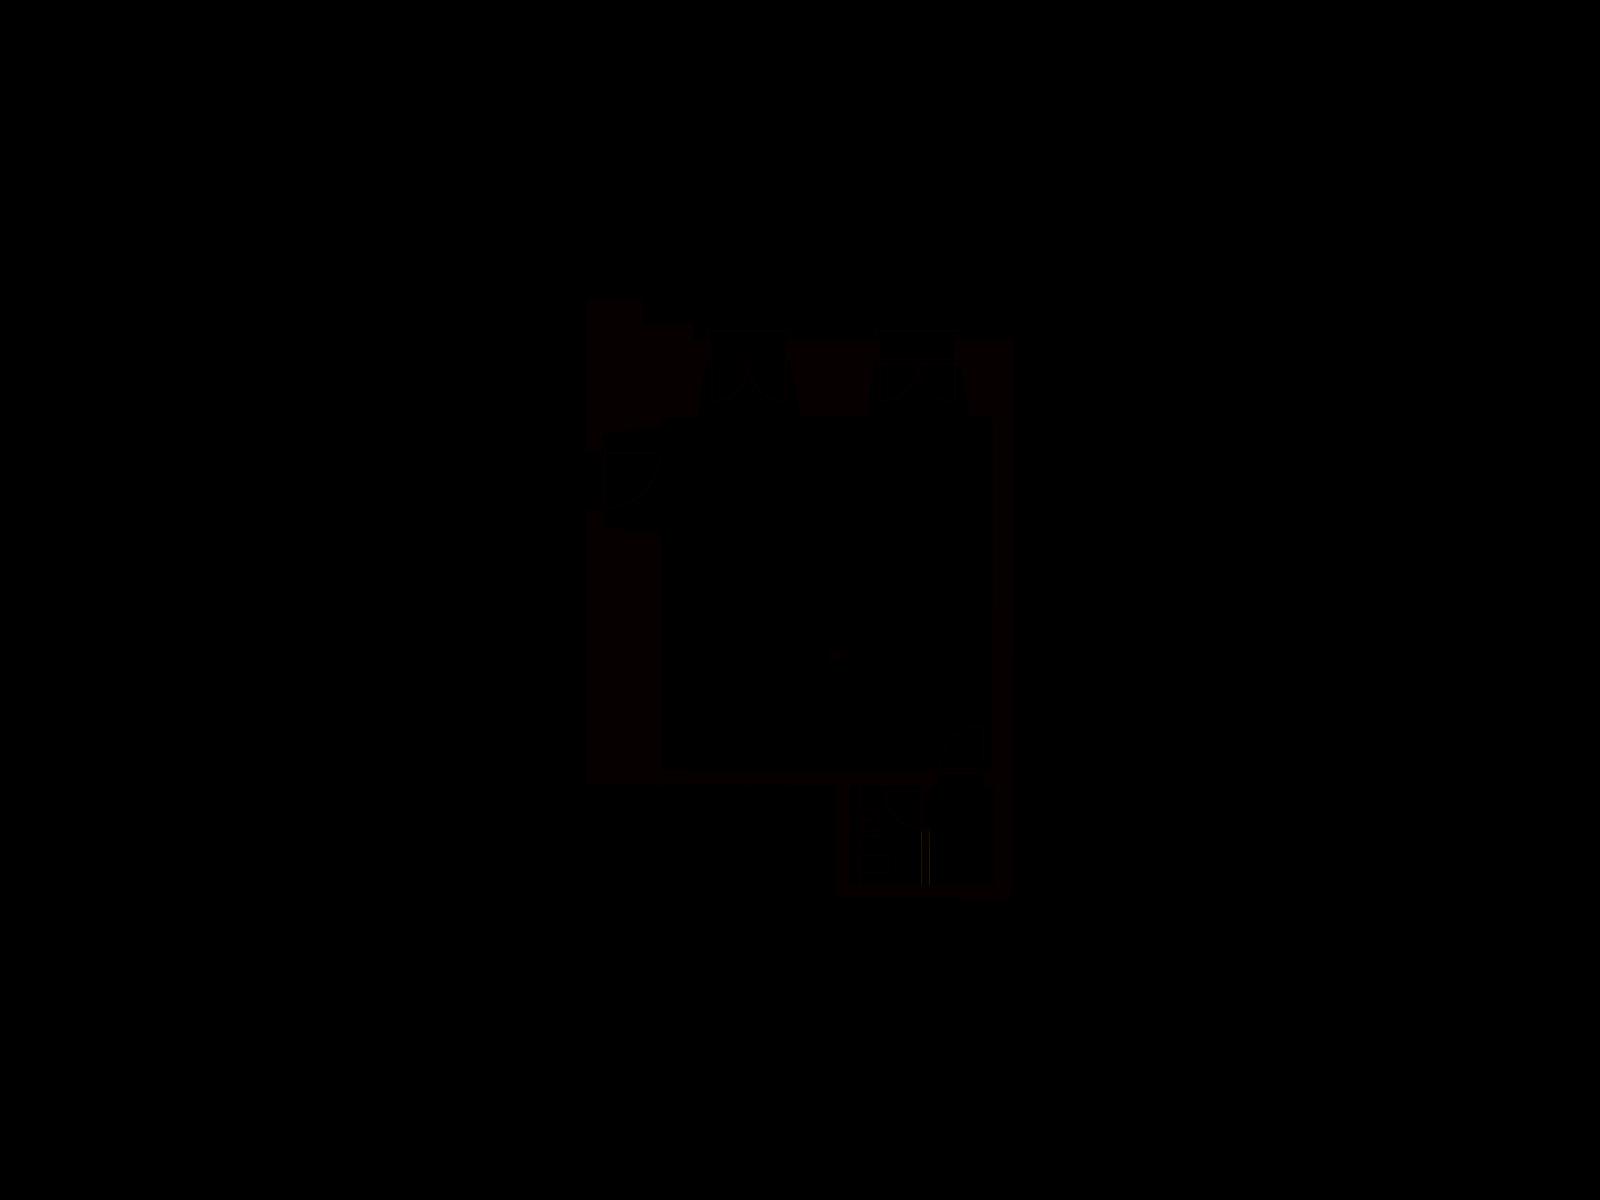 AE 01